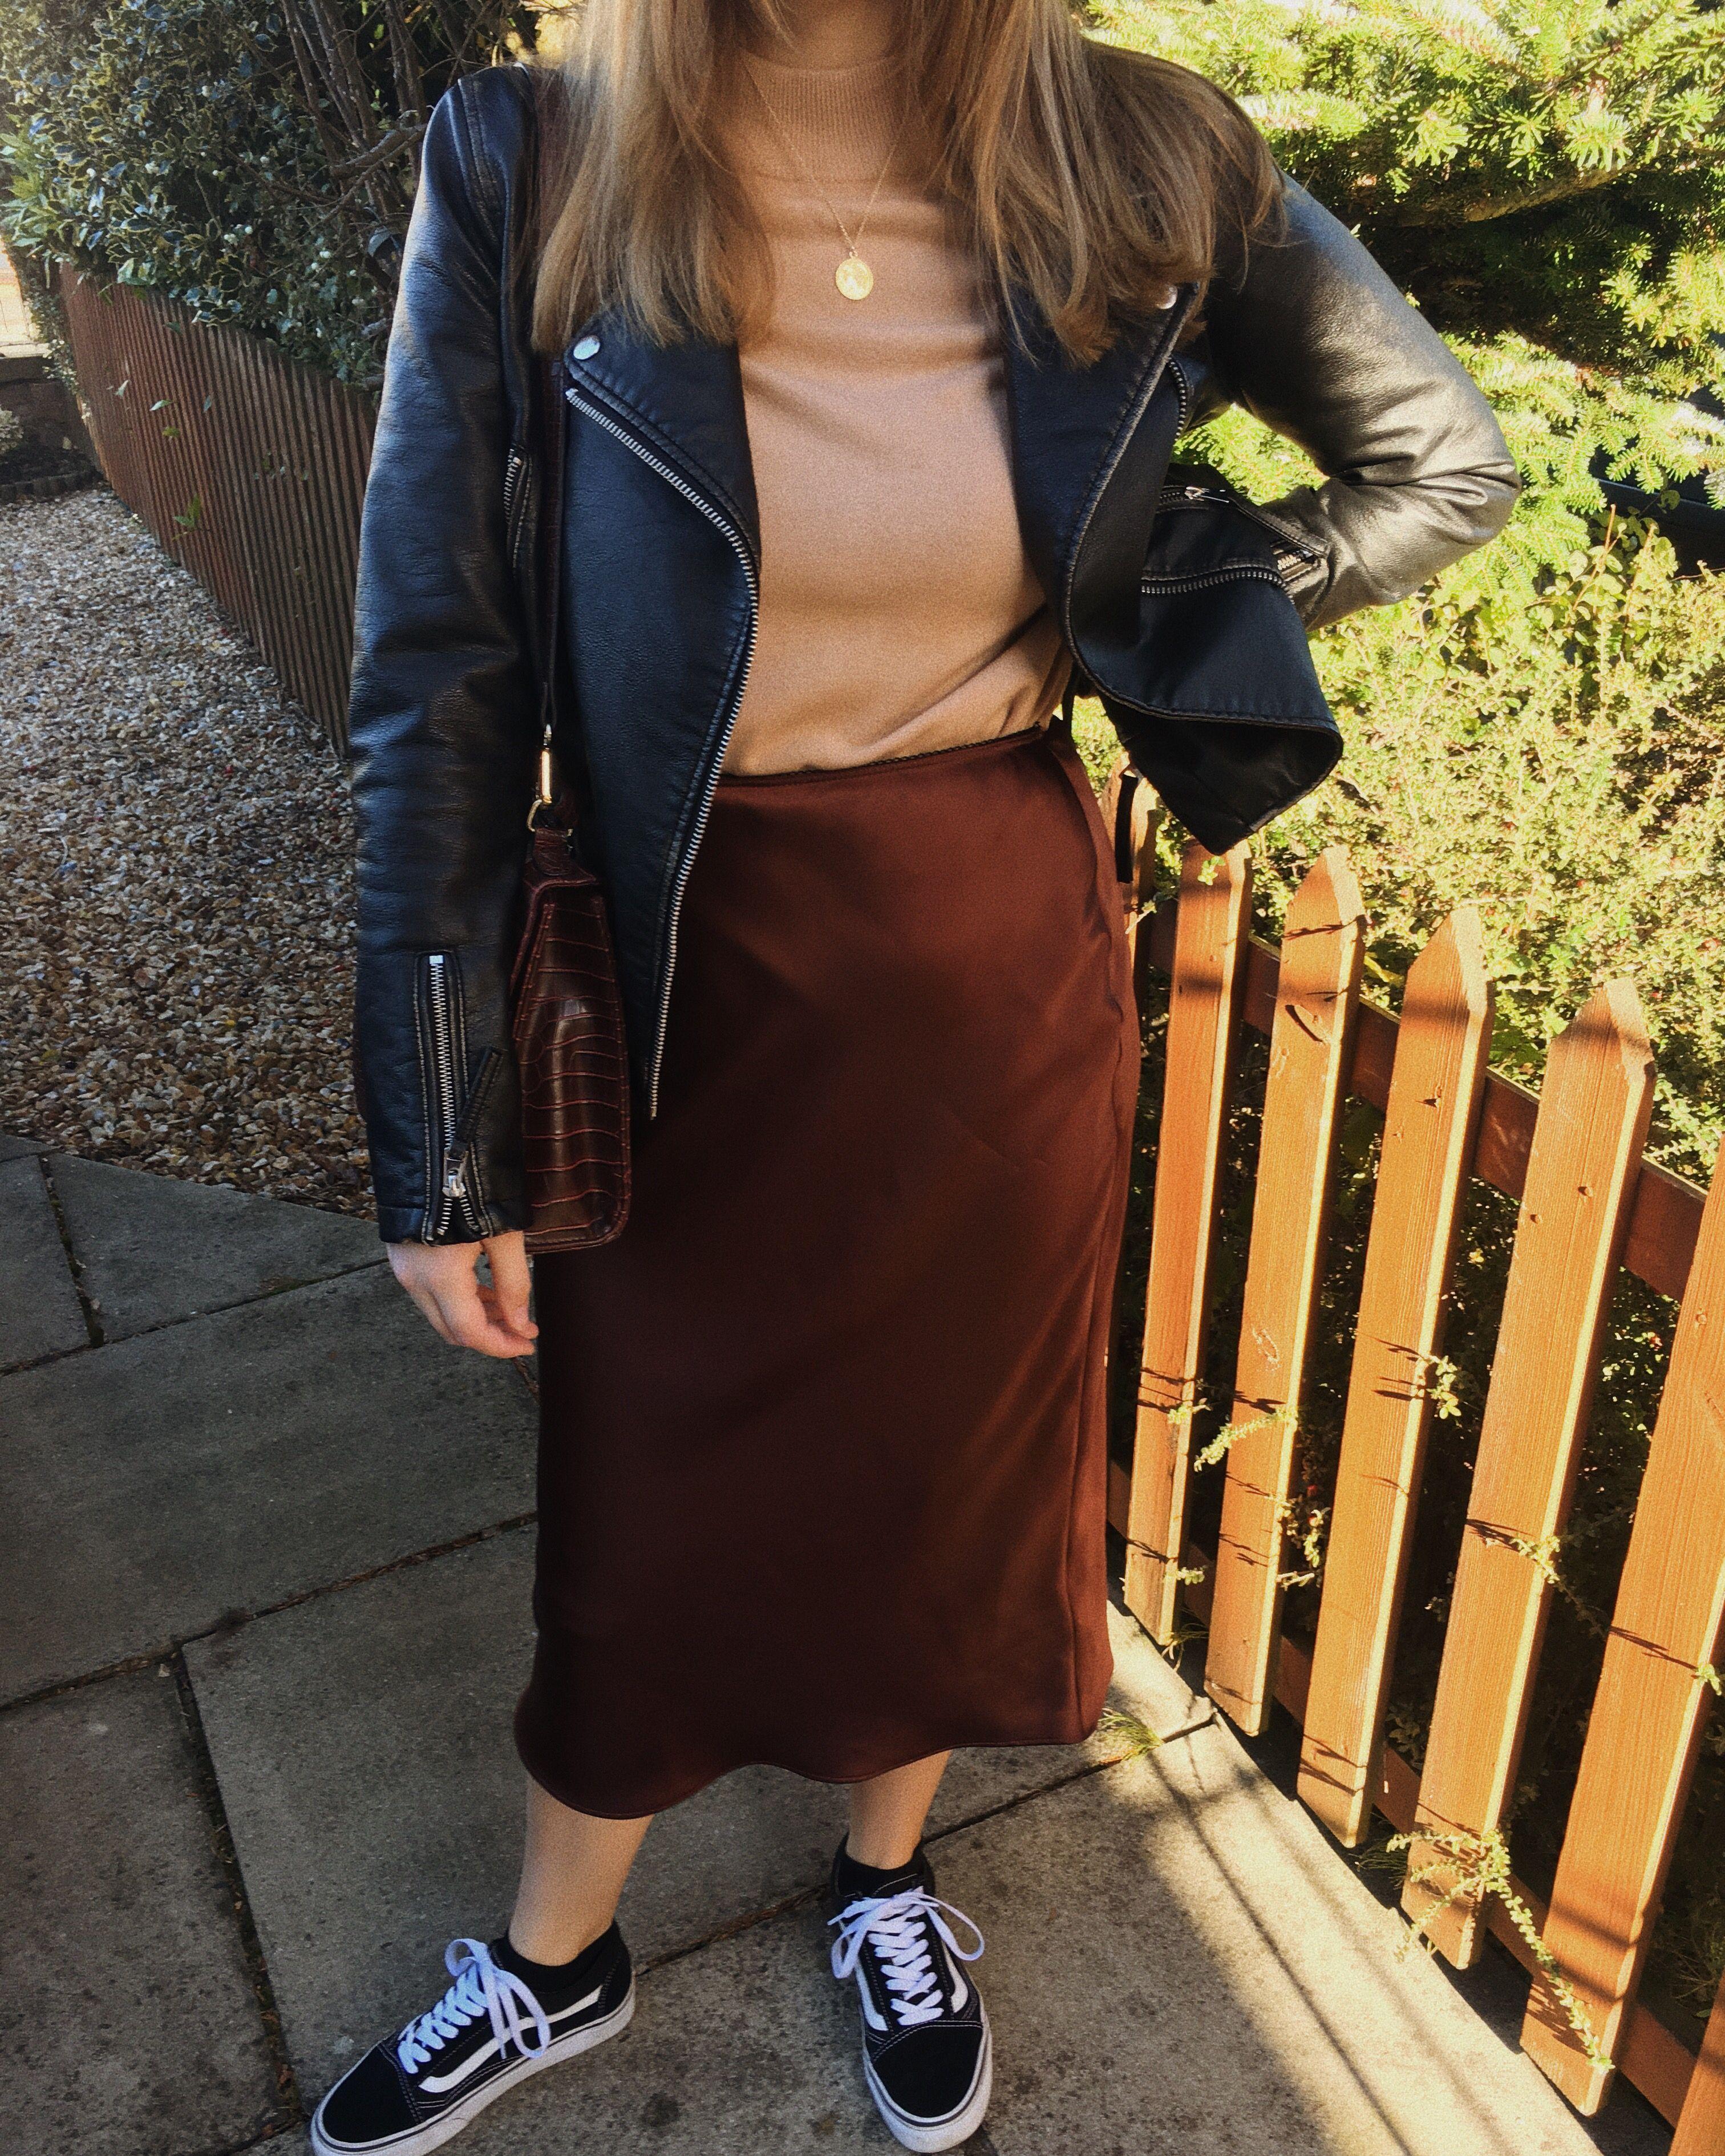 00551586ecee Camel Jumper- second hand M&S Chocolate brown satin midi skirt- Topshop  Faux leather jacket- Topshop Burgundy satchel- ASOS Shoes- Old Skool Vans  Gold ...